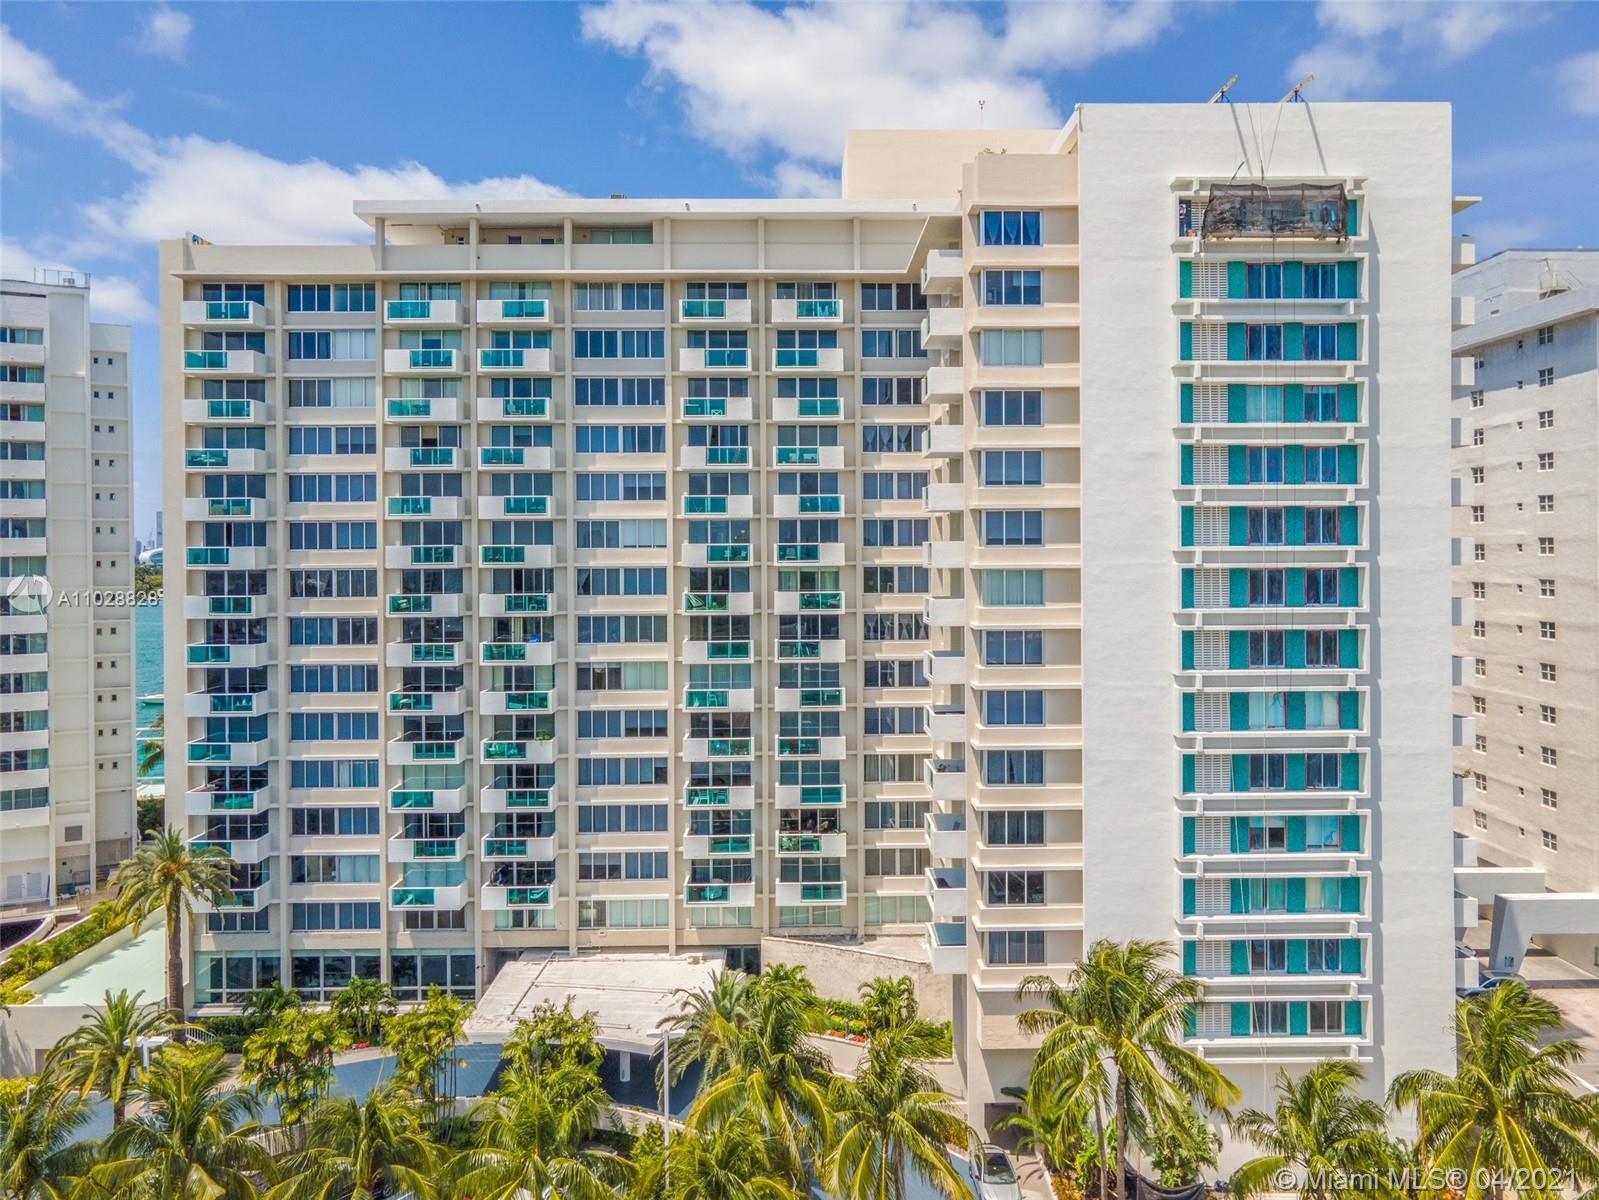 Mirador North #1424 - 1200 West Ave #1424, Miami Beach, FL 33139